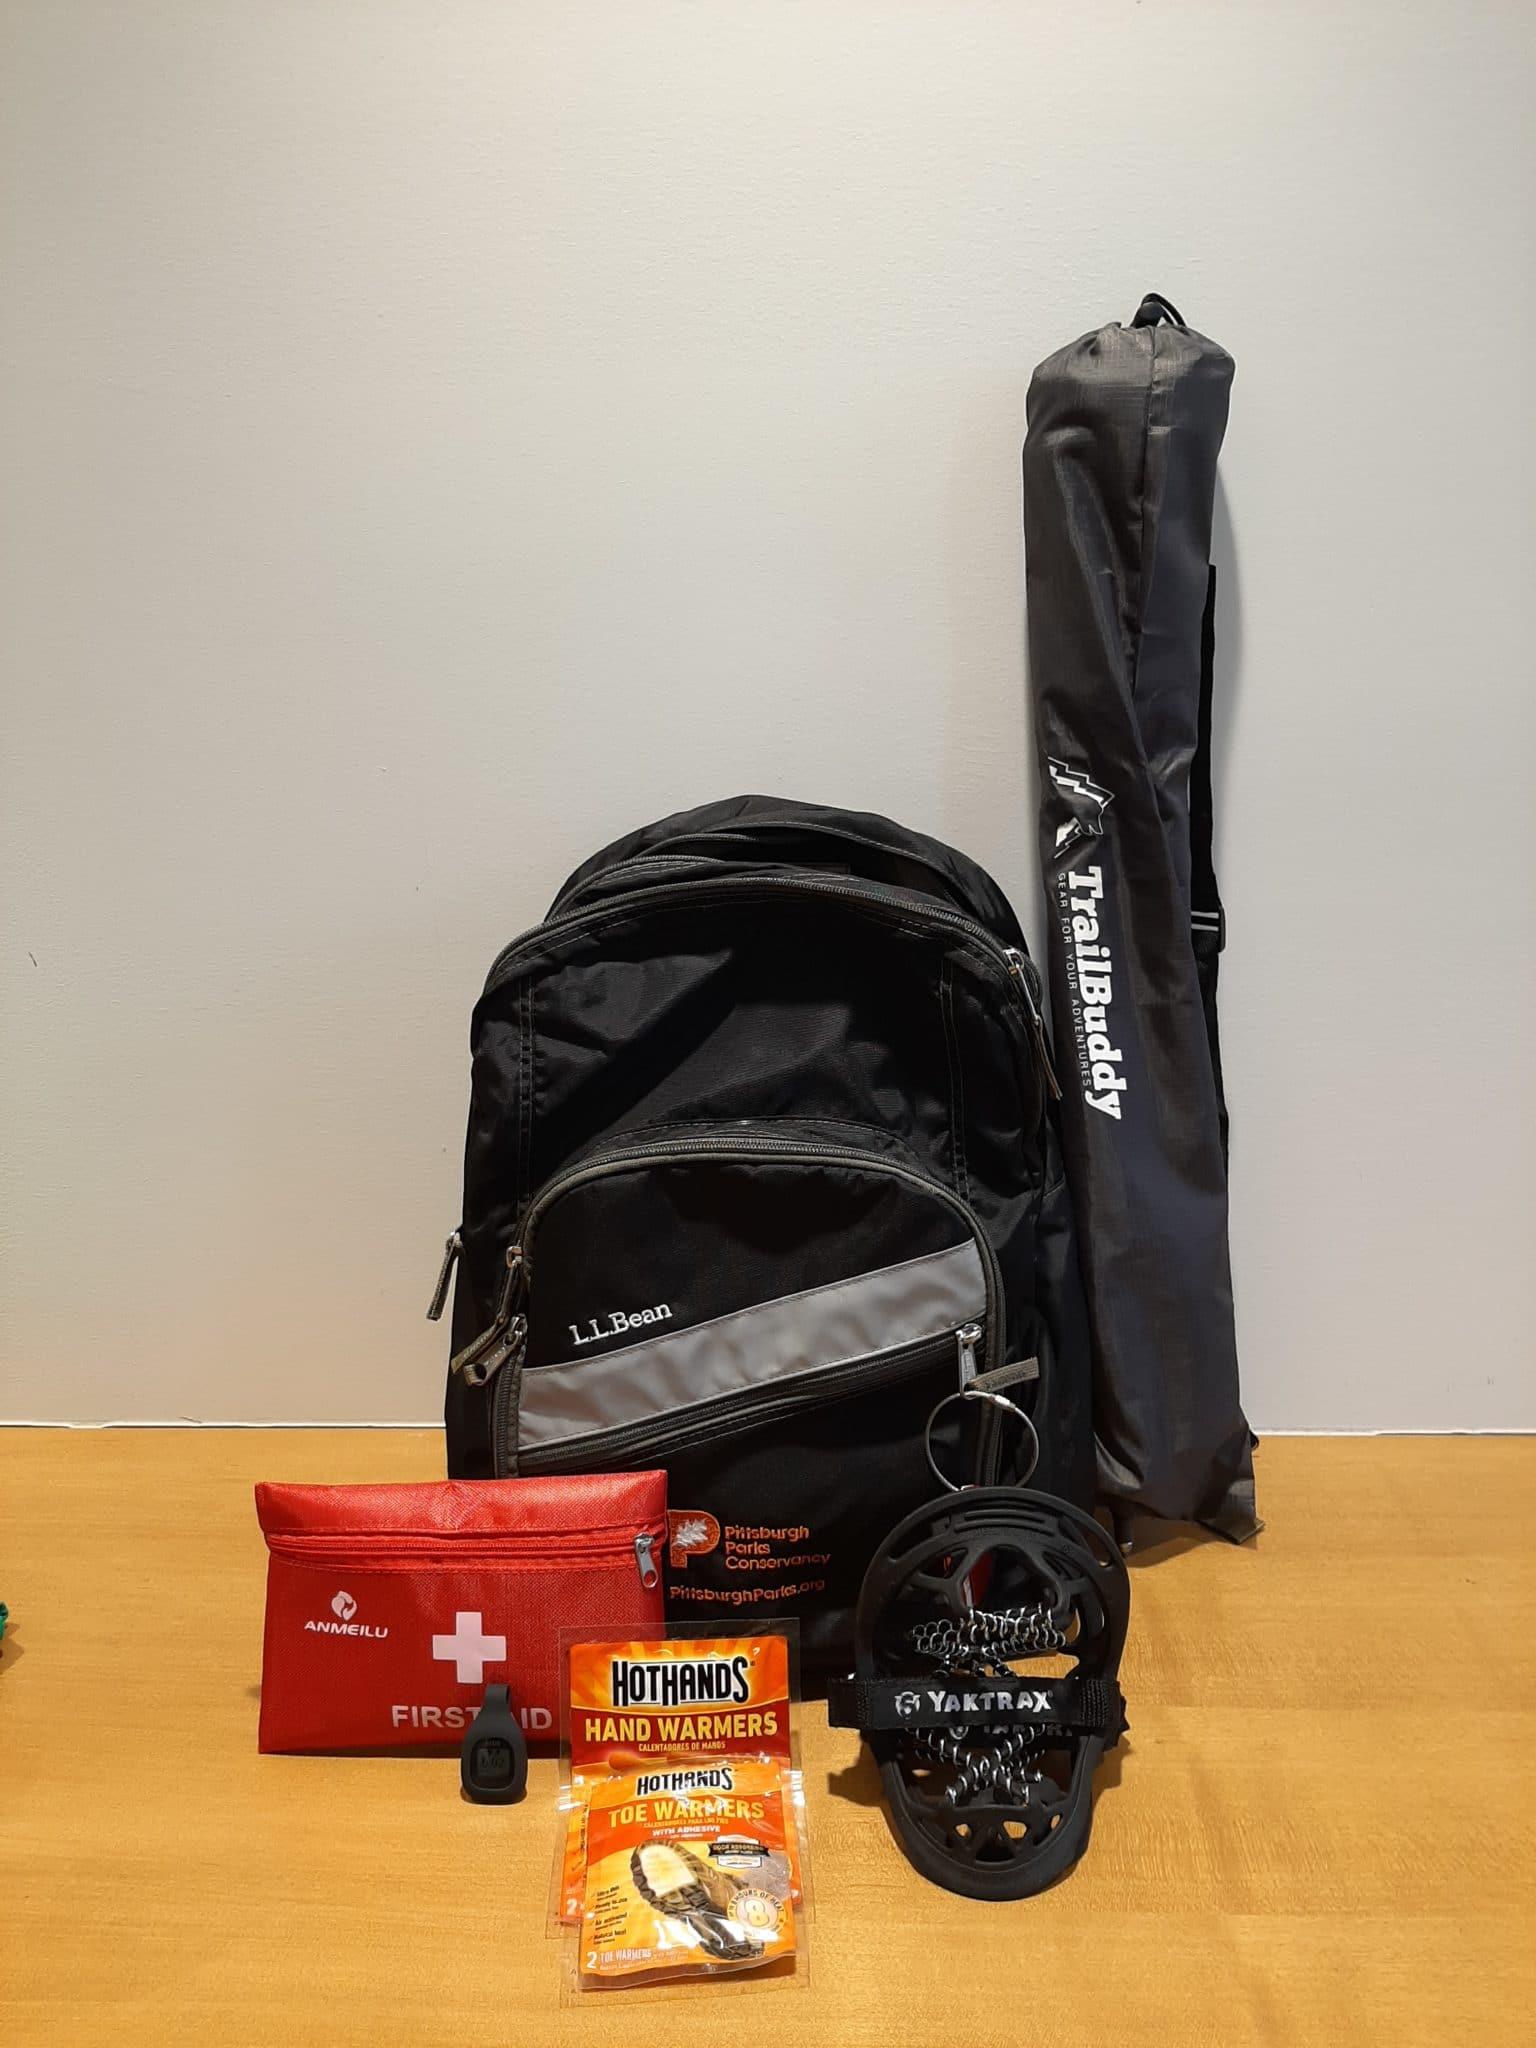 Healthbackpack